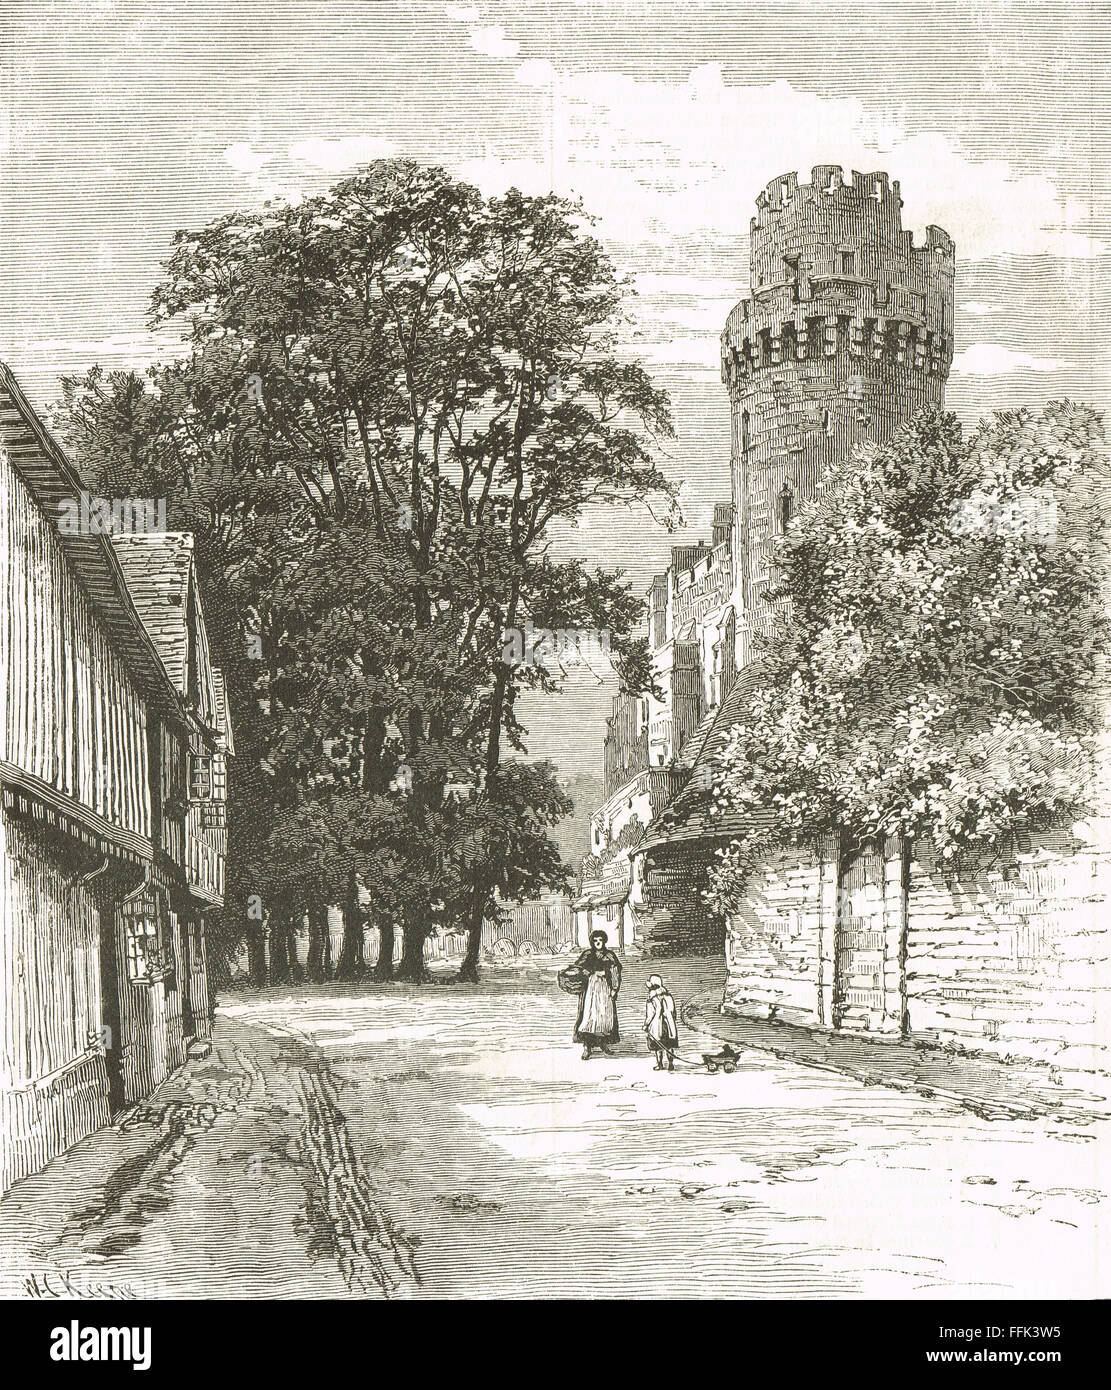 Caesar's Tower Warwick Castle England - Stock Image